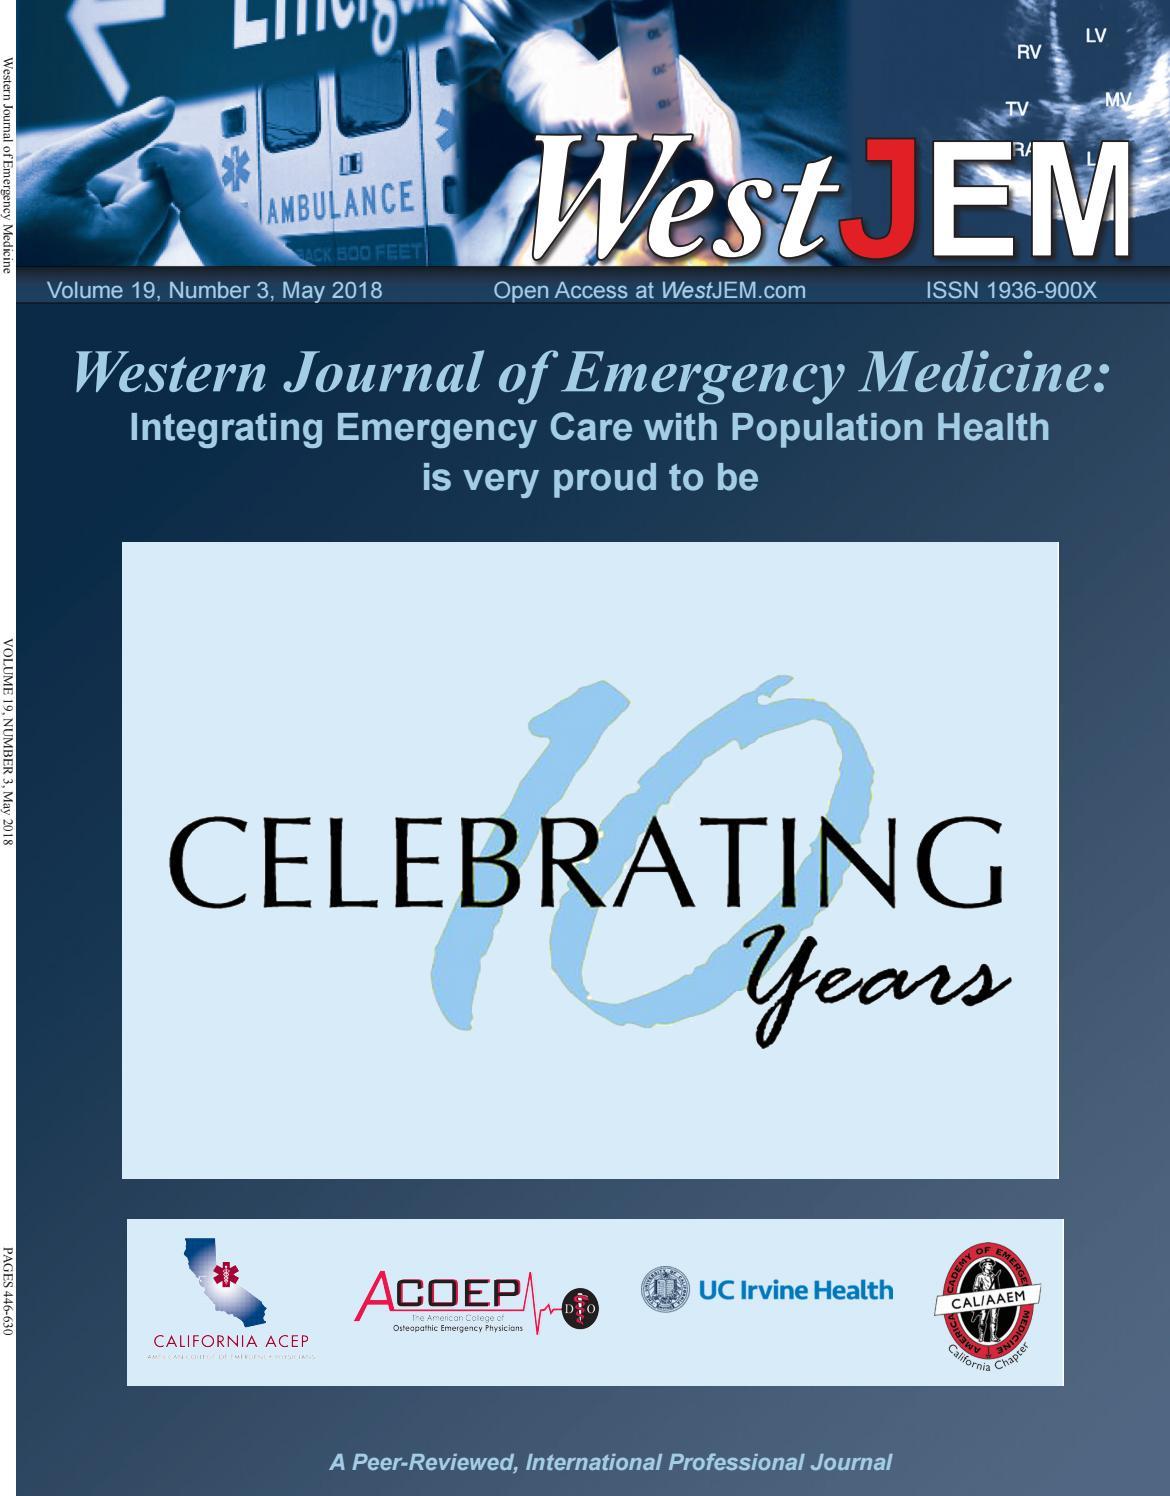 Volume 19 Issue 3 by Western Journal of Emergency Medicine